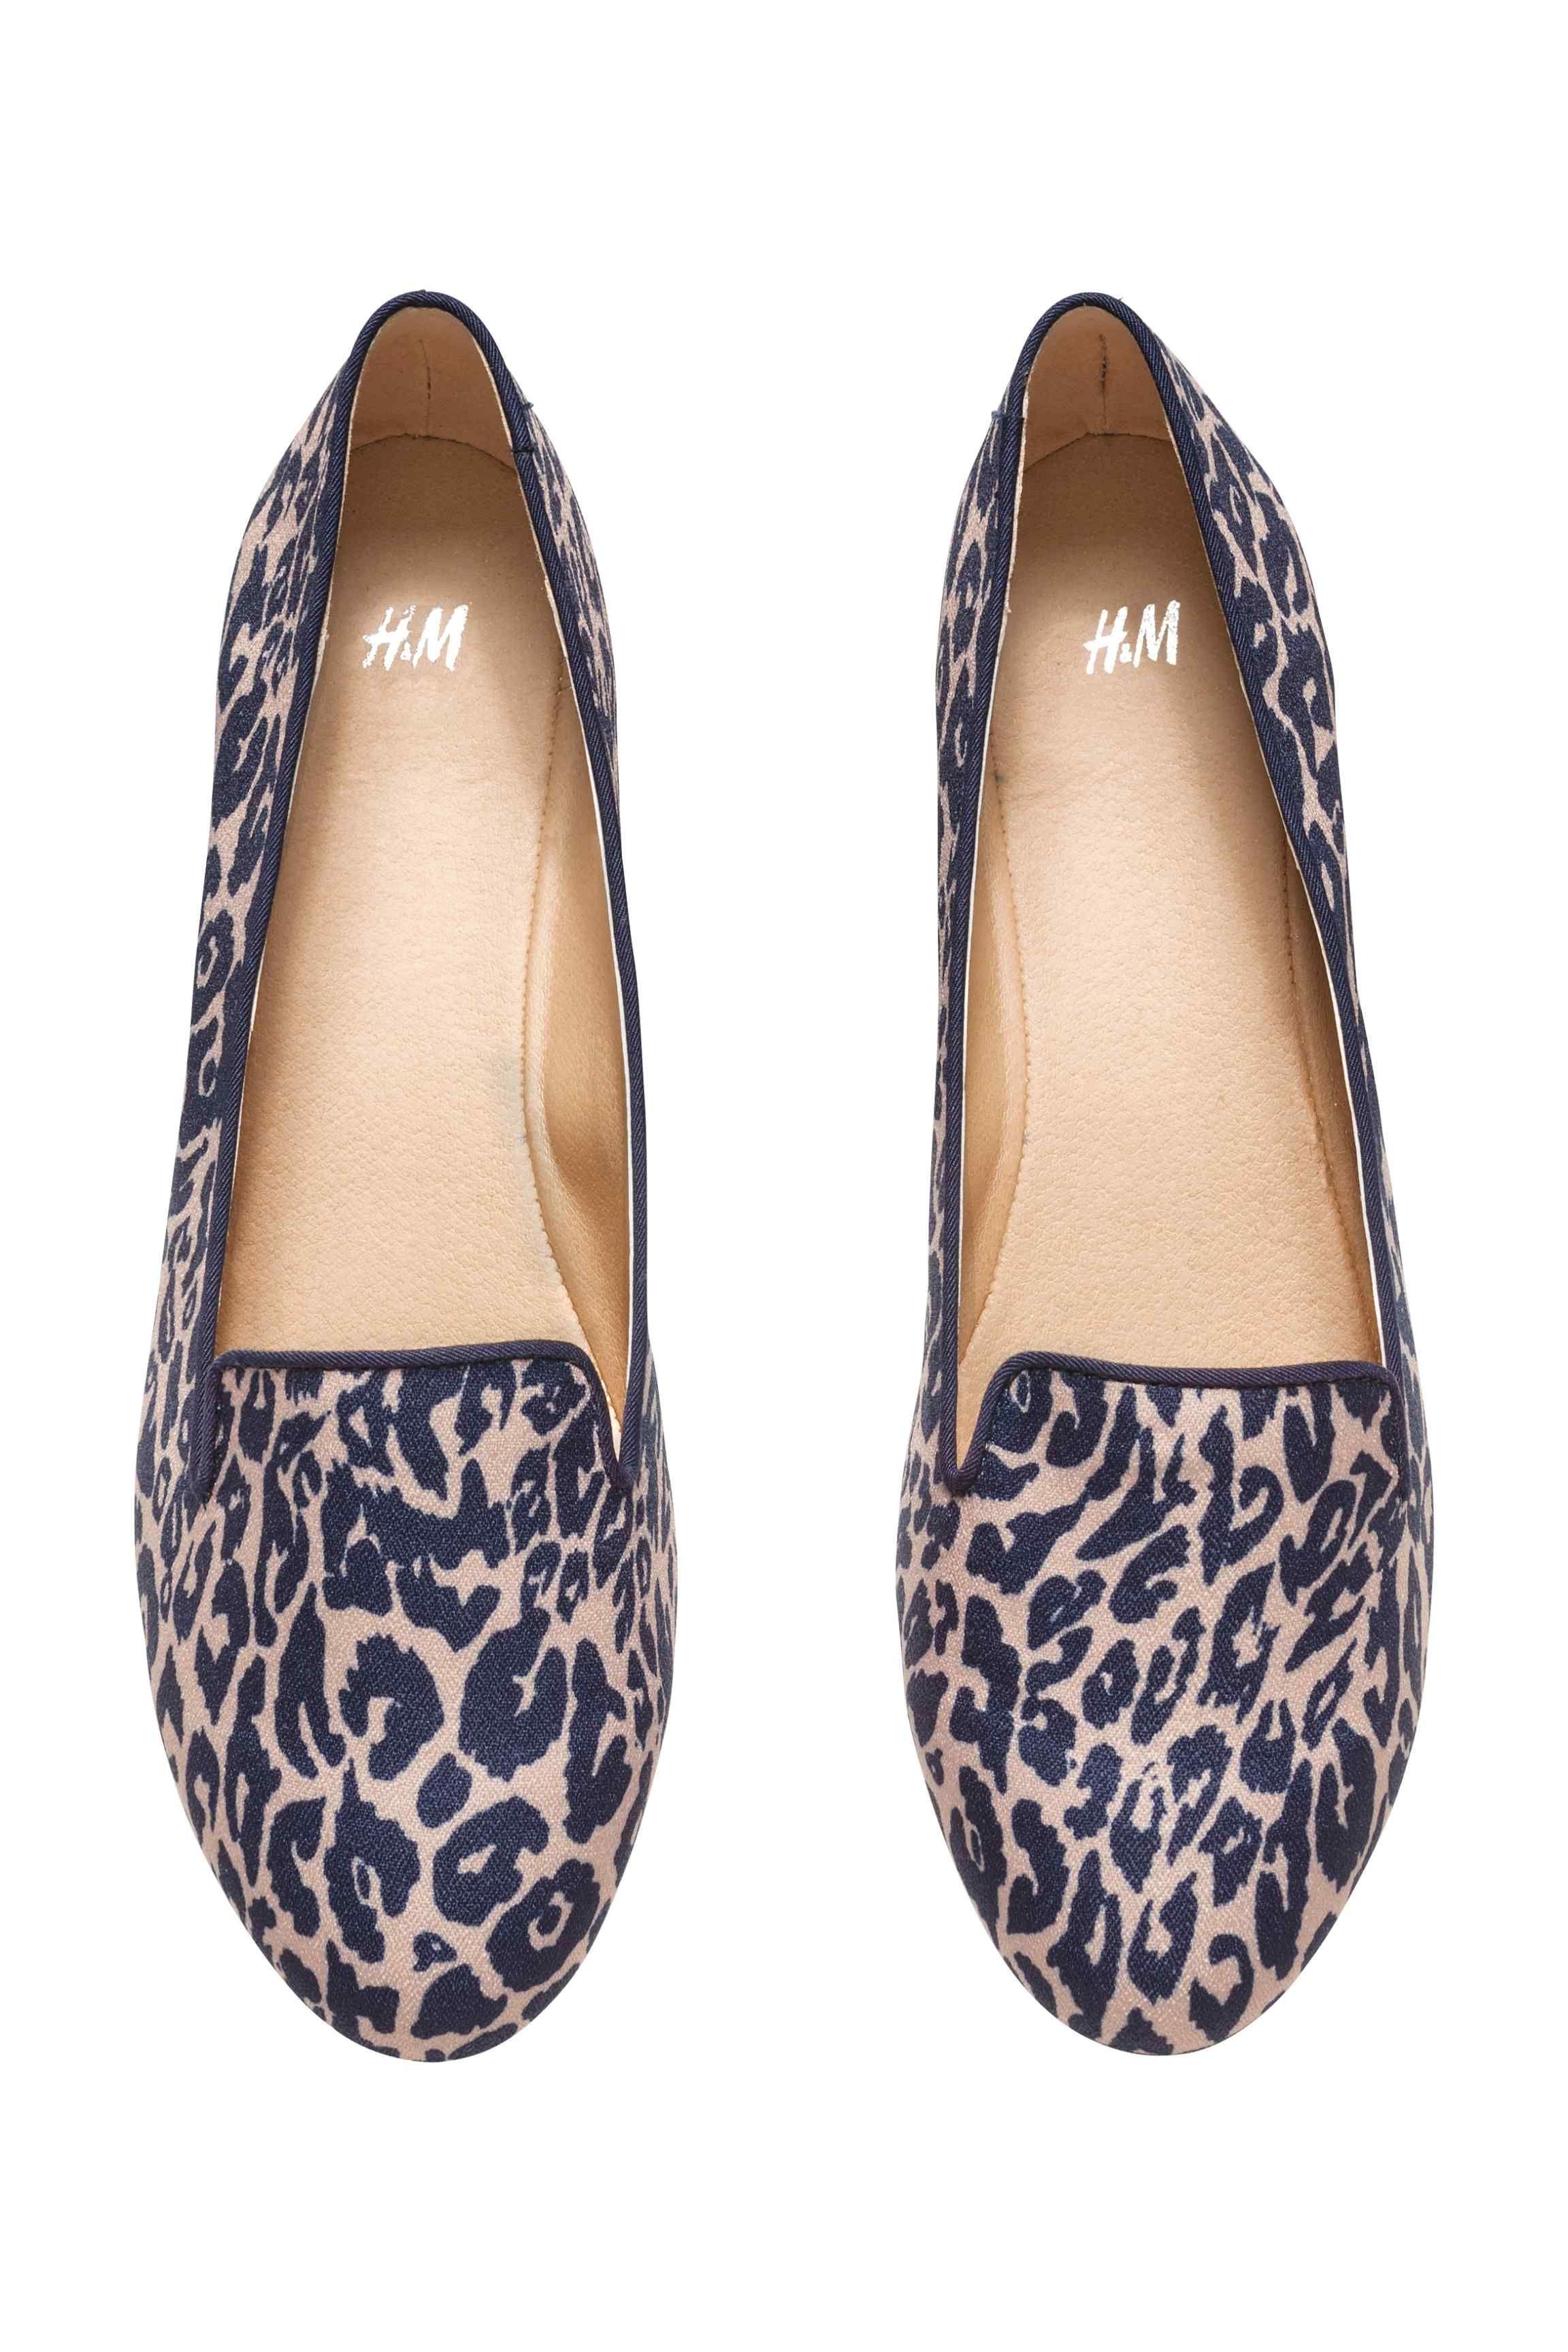 Mocassini | Scarpe ballerine, Scarpe di moda, Scarpe